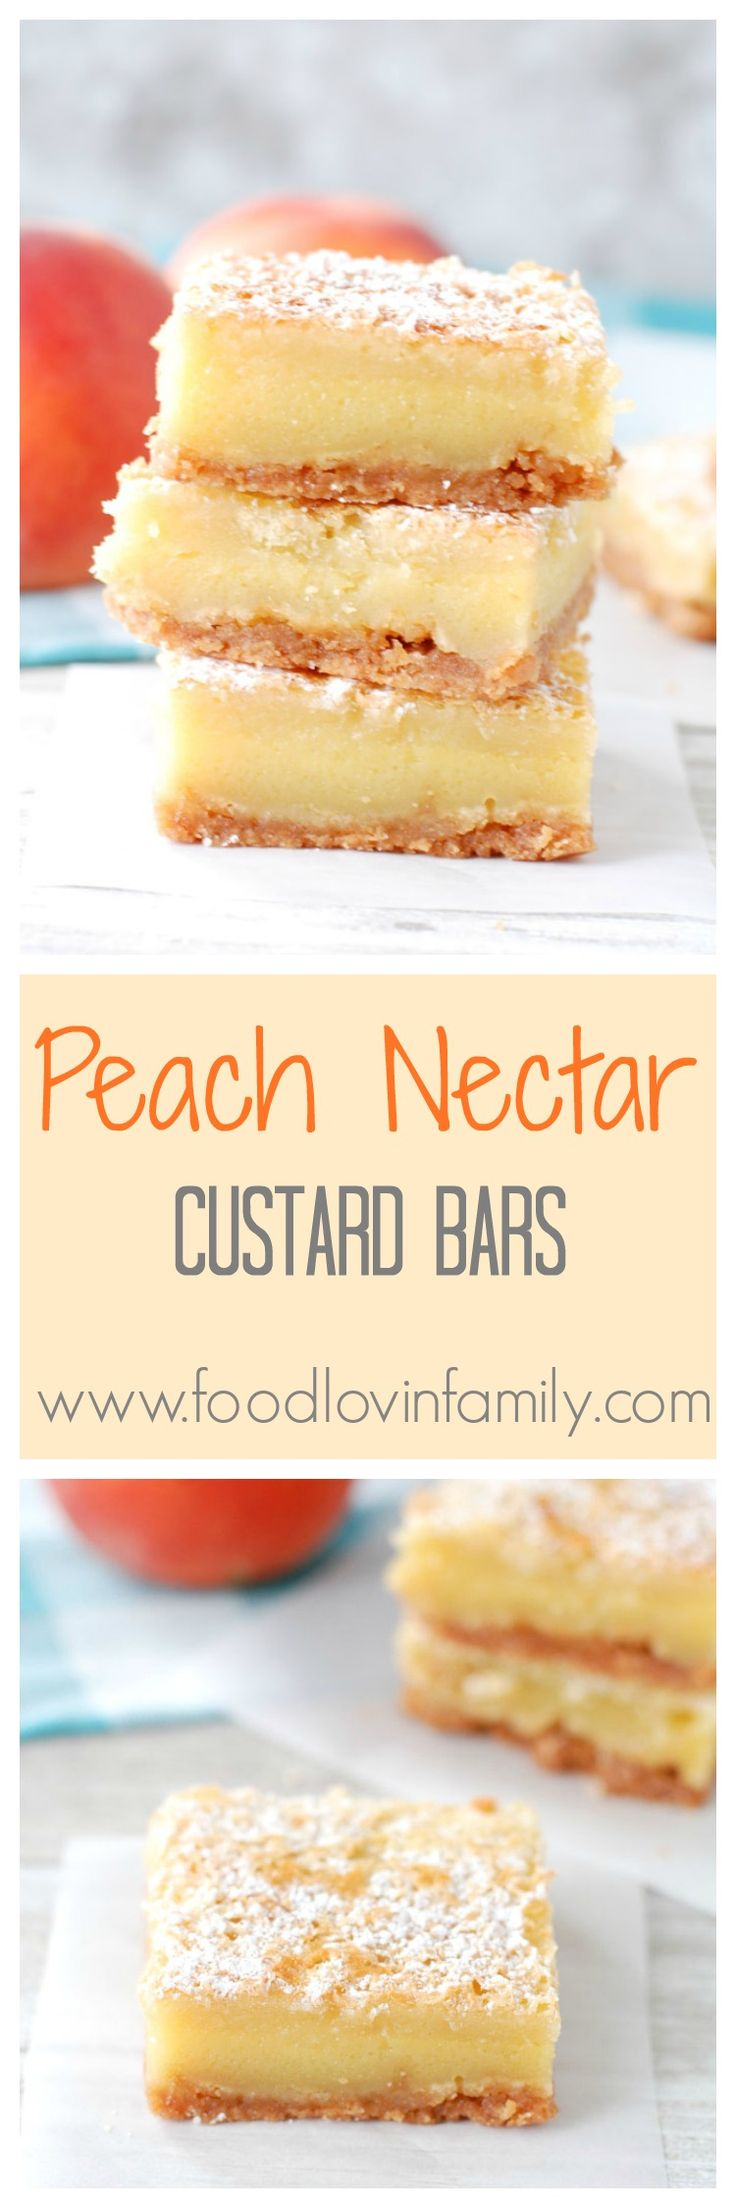 Peach Nectar Custard Bars   Peach Nectar Custard Bars start with a crushed vanilla wafer crust, topped with a custard like filling, sugar crust top and dusted with powdered sugar. http://www.foodlovinfamily.com/peach-nectar-custard-bars/